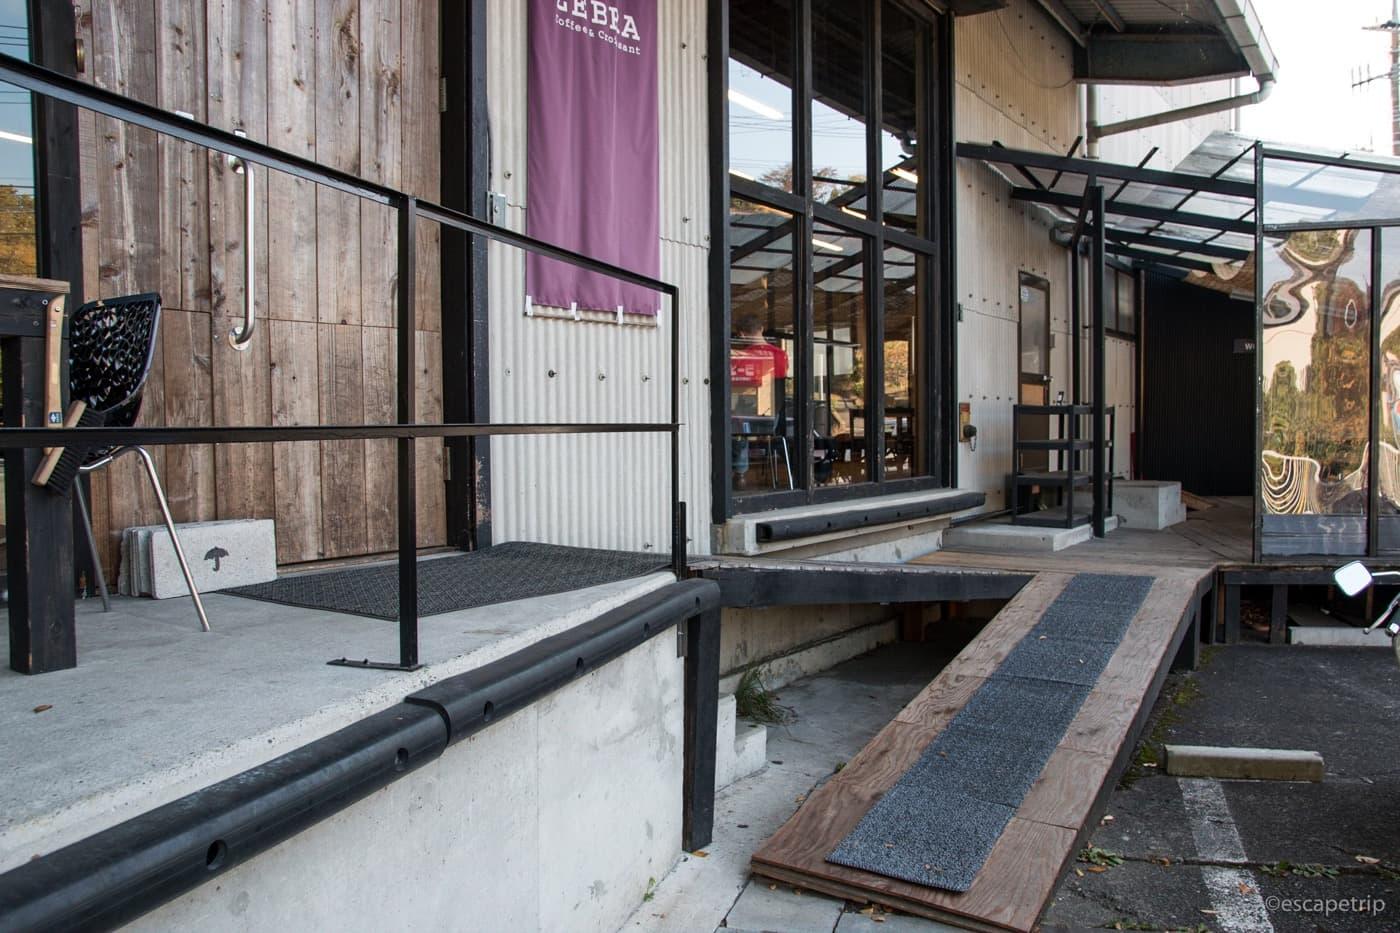 ZEBRAカフェの入り口のスロープ